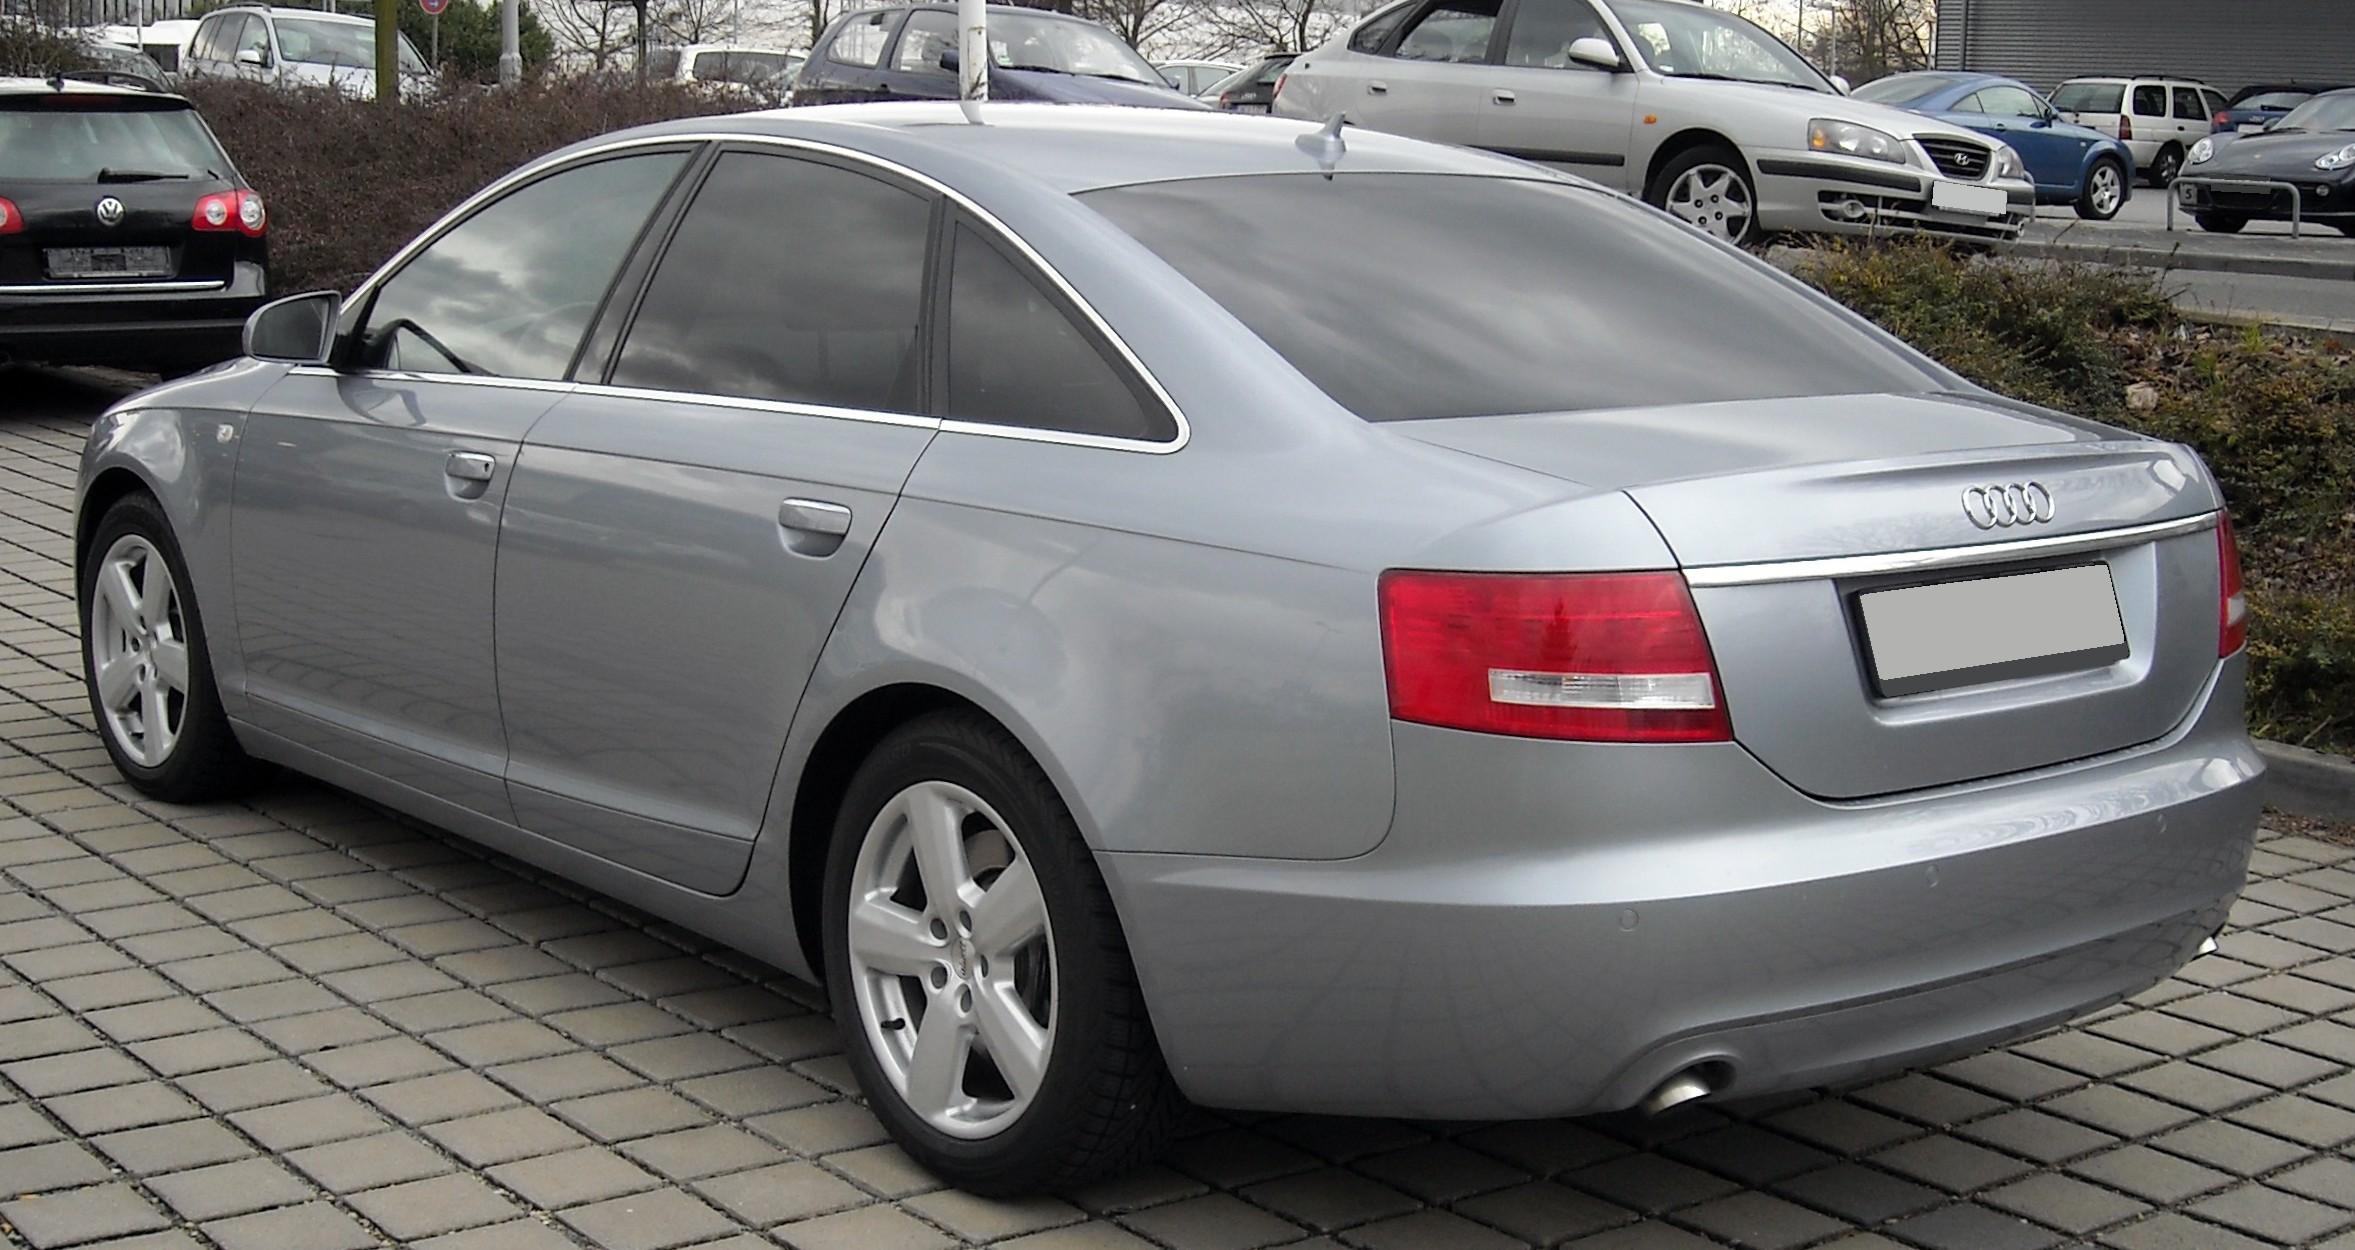 File:Audi A6 C6 rear 20090329.jpg - Wikimedia Commons